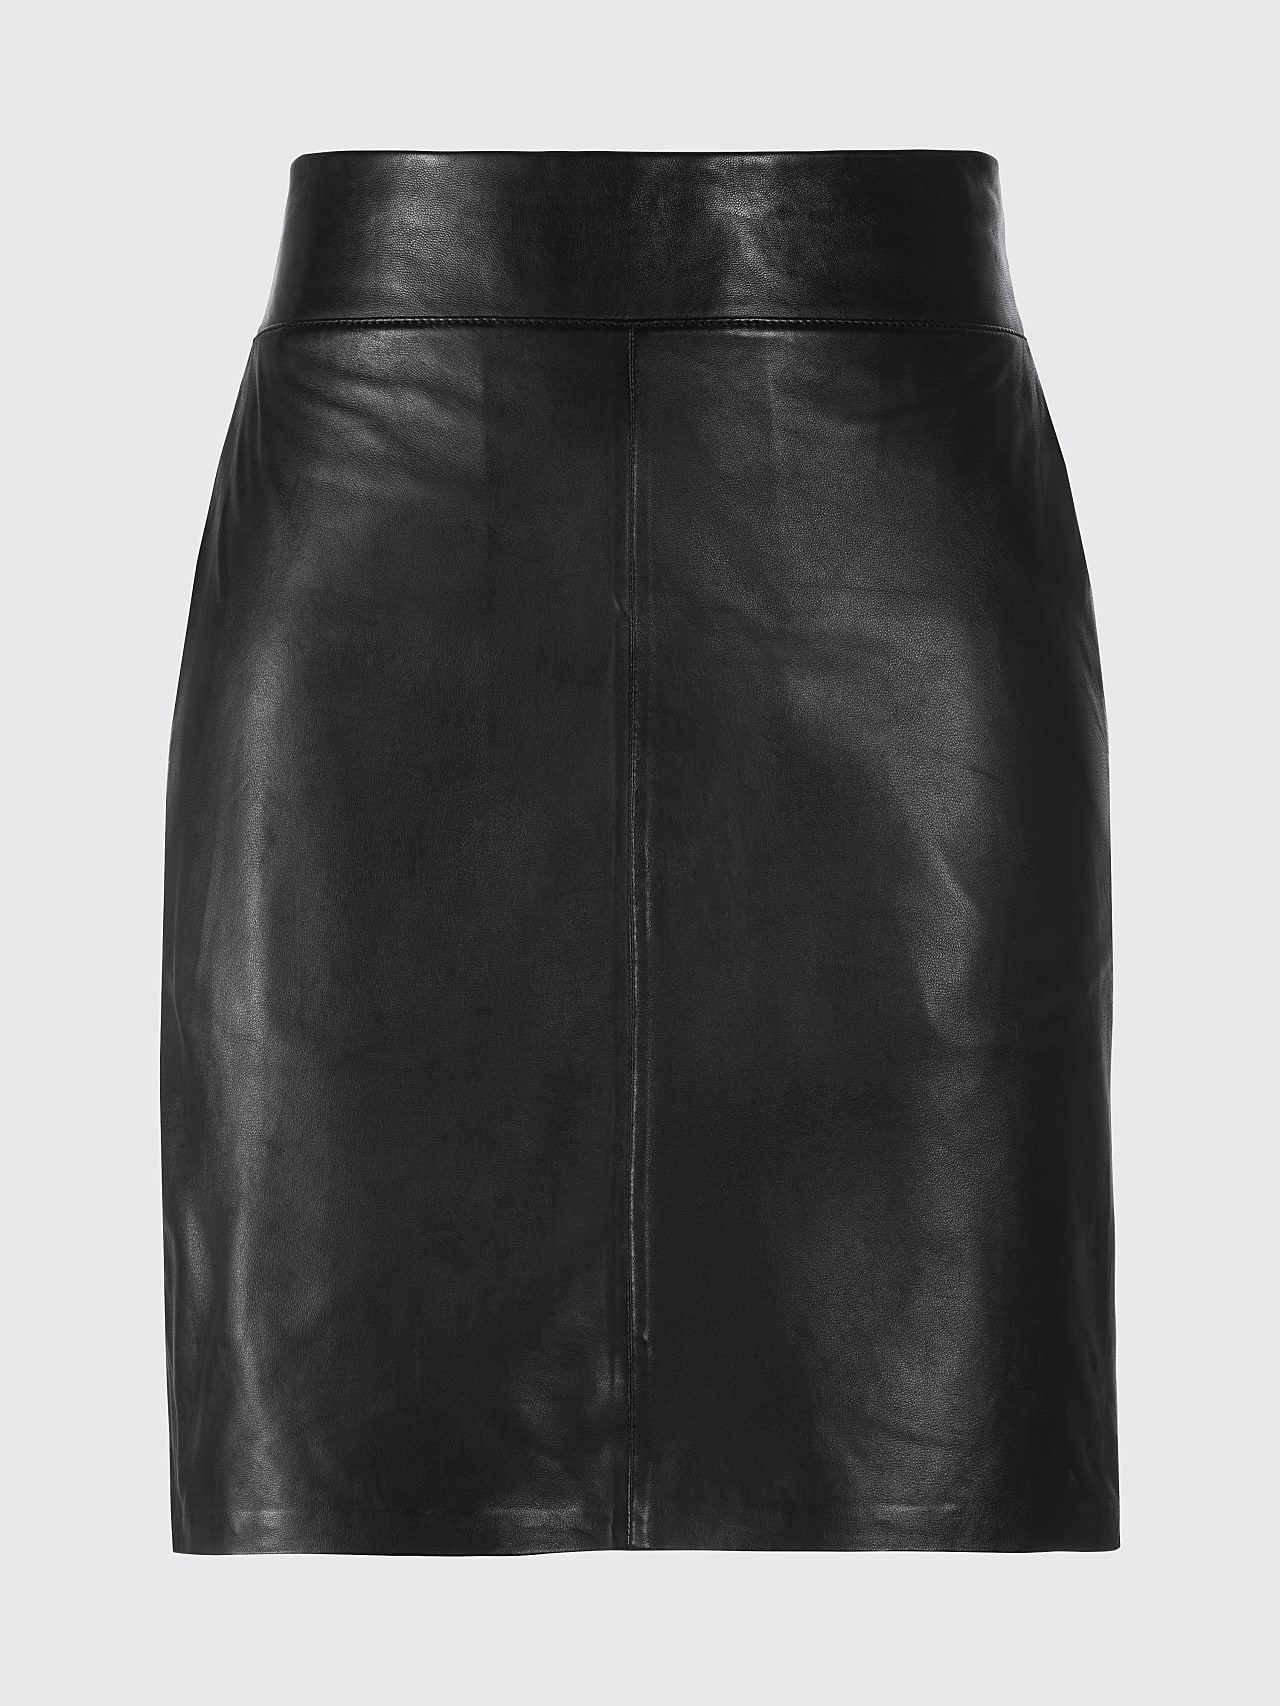 LEXSI V1.Y5.01 Leather Pencil Skirt black Back Alpha Tauri